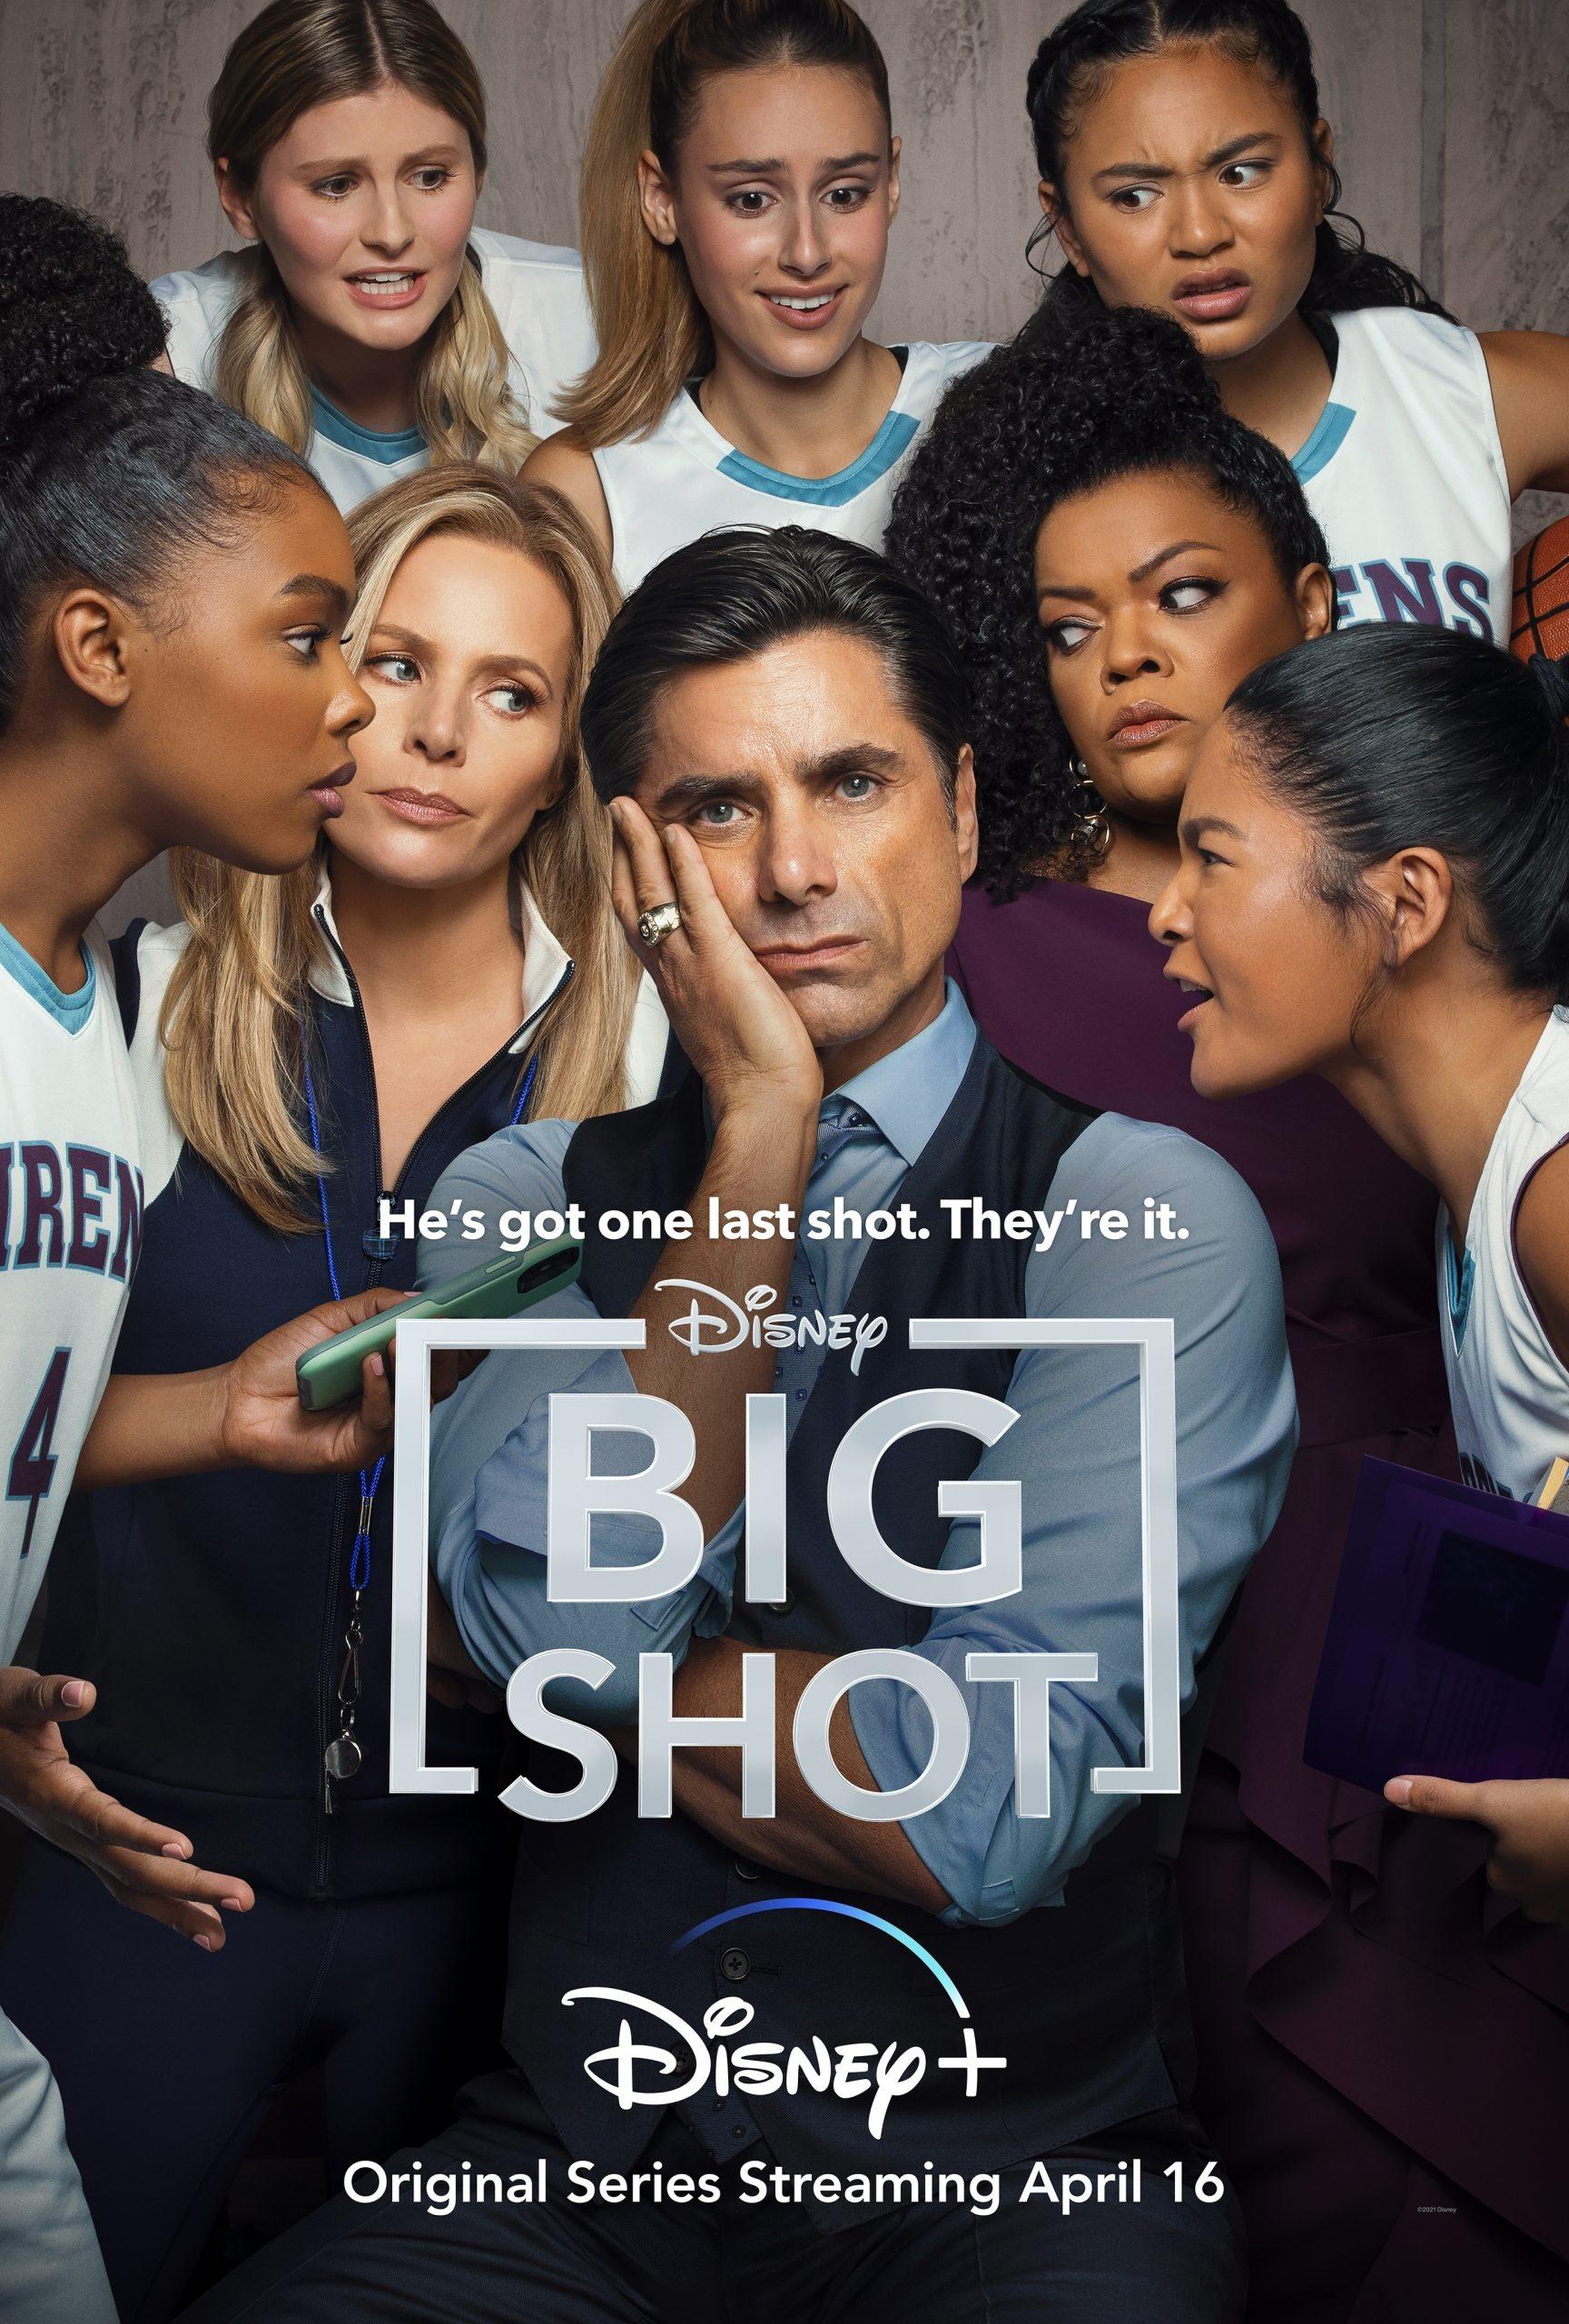 Disney + Original Series: 'Big Shot' Starring John Stamos